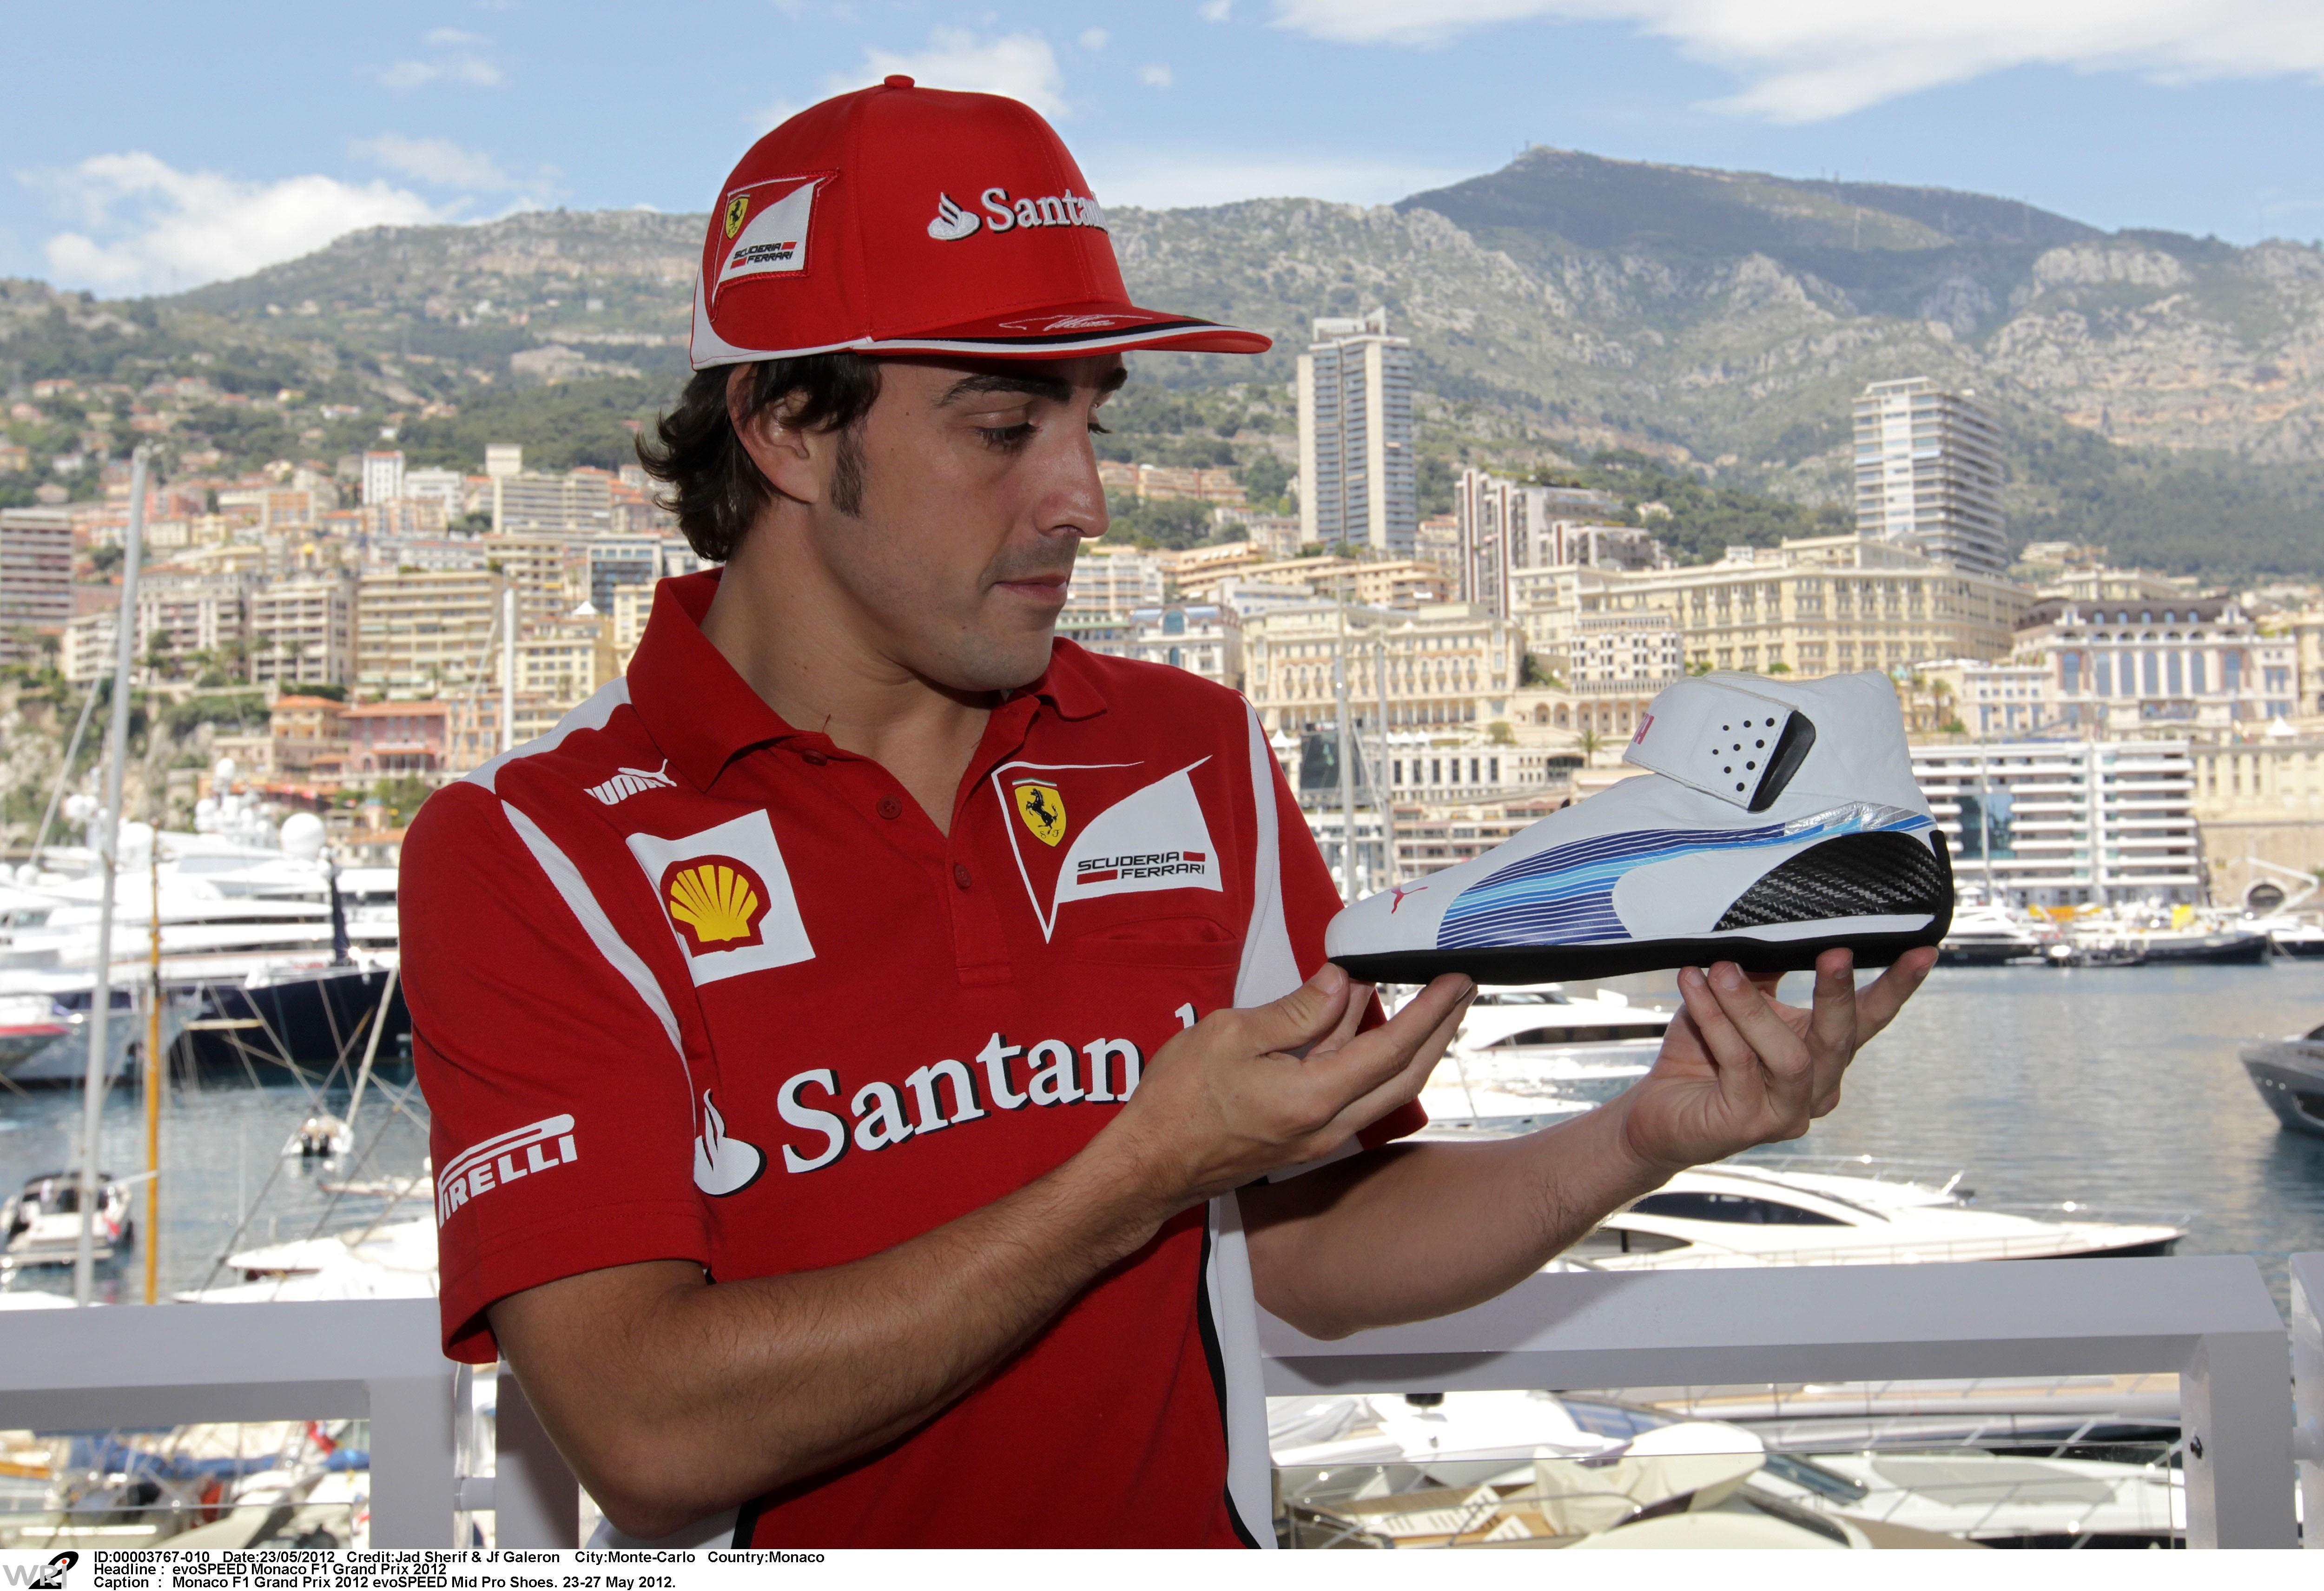 congelado Estar confundido cansado  Sport-locker.net Interview with Fernando Alonso – SportLocker